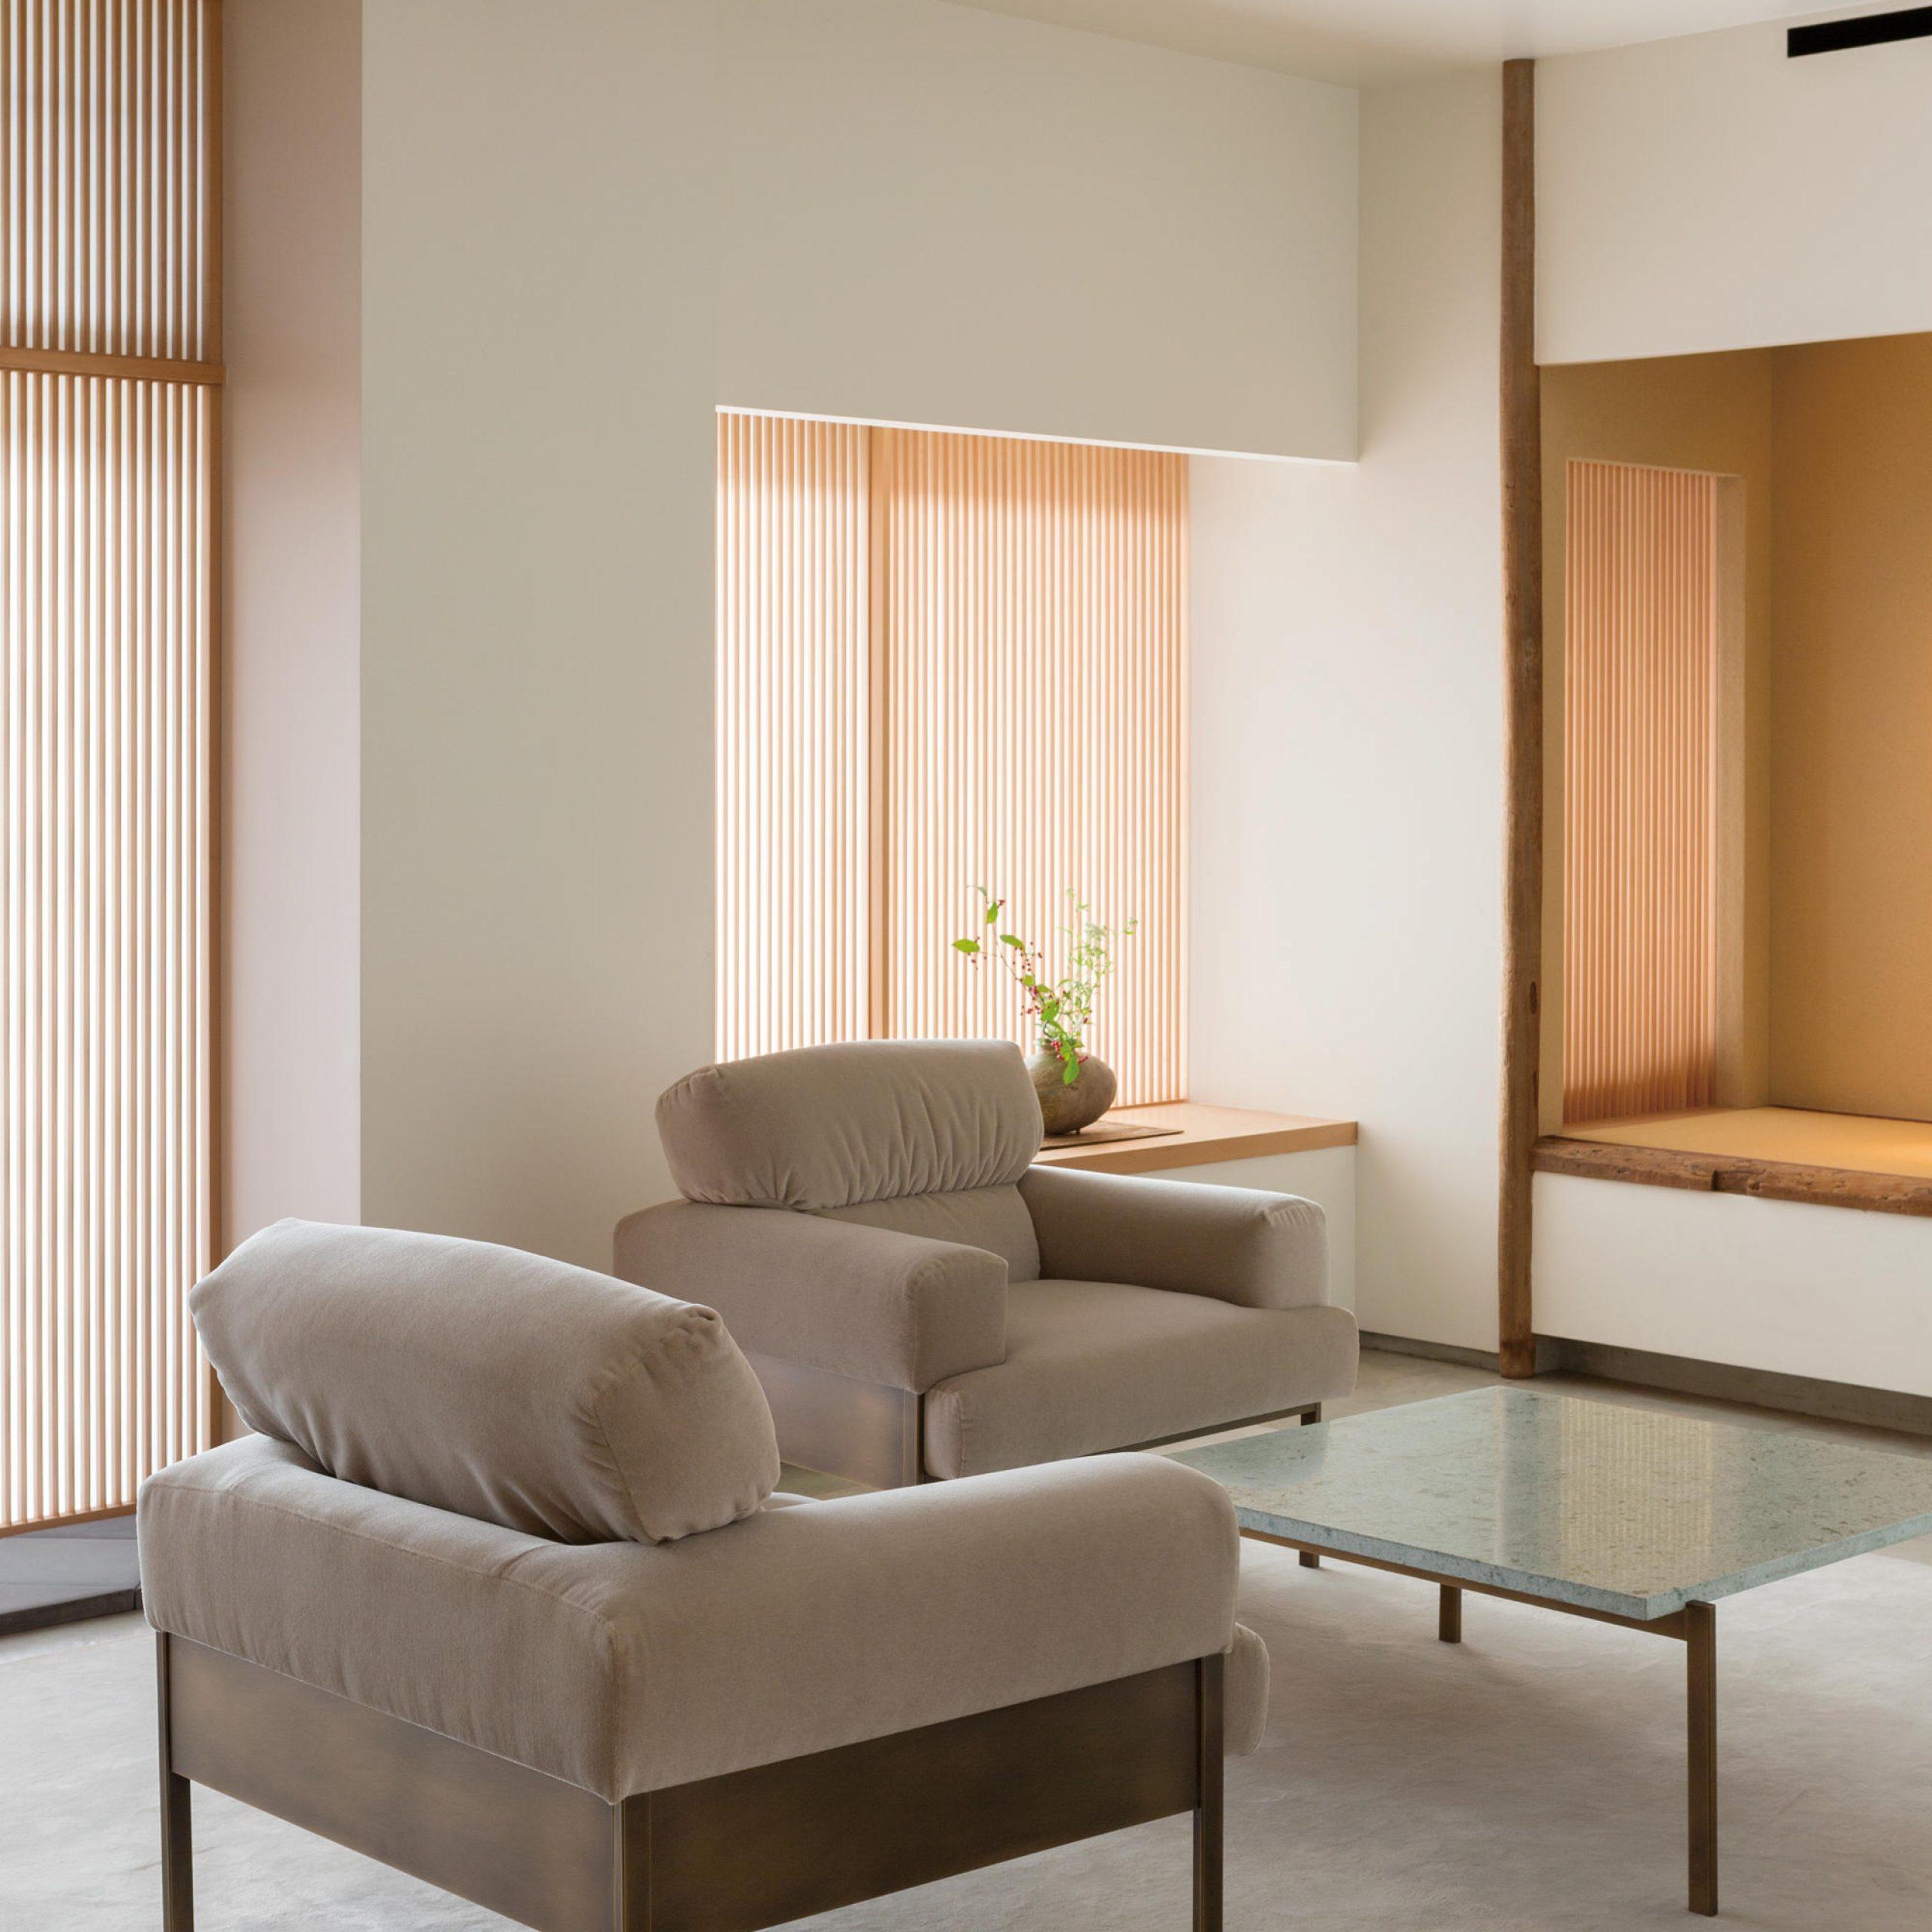 Suki | Armchair & Designer Furniture | Architonic Within Suki Armchairs (View 7 of 15)